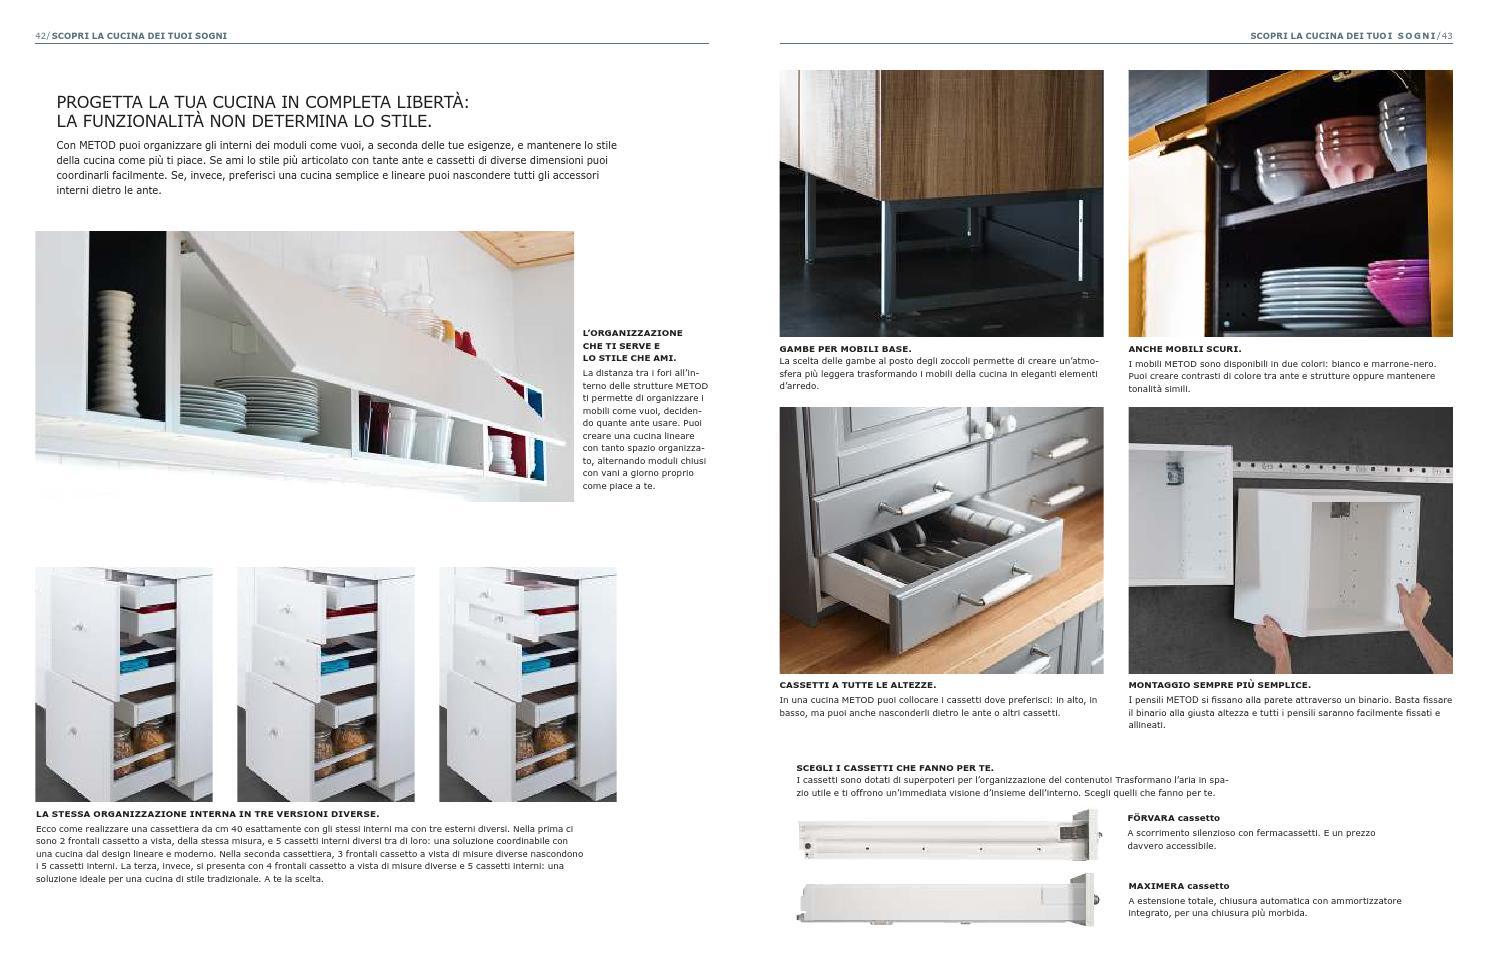 Binario Pensili Cucina Ikea ikea catalogo cucine 2014 by mobilpro - issuu